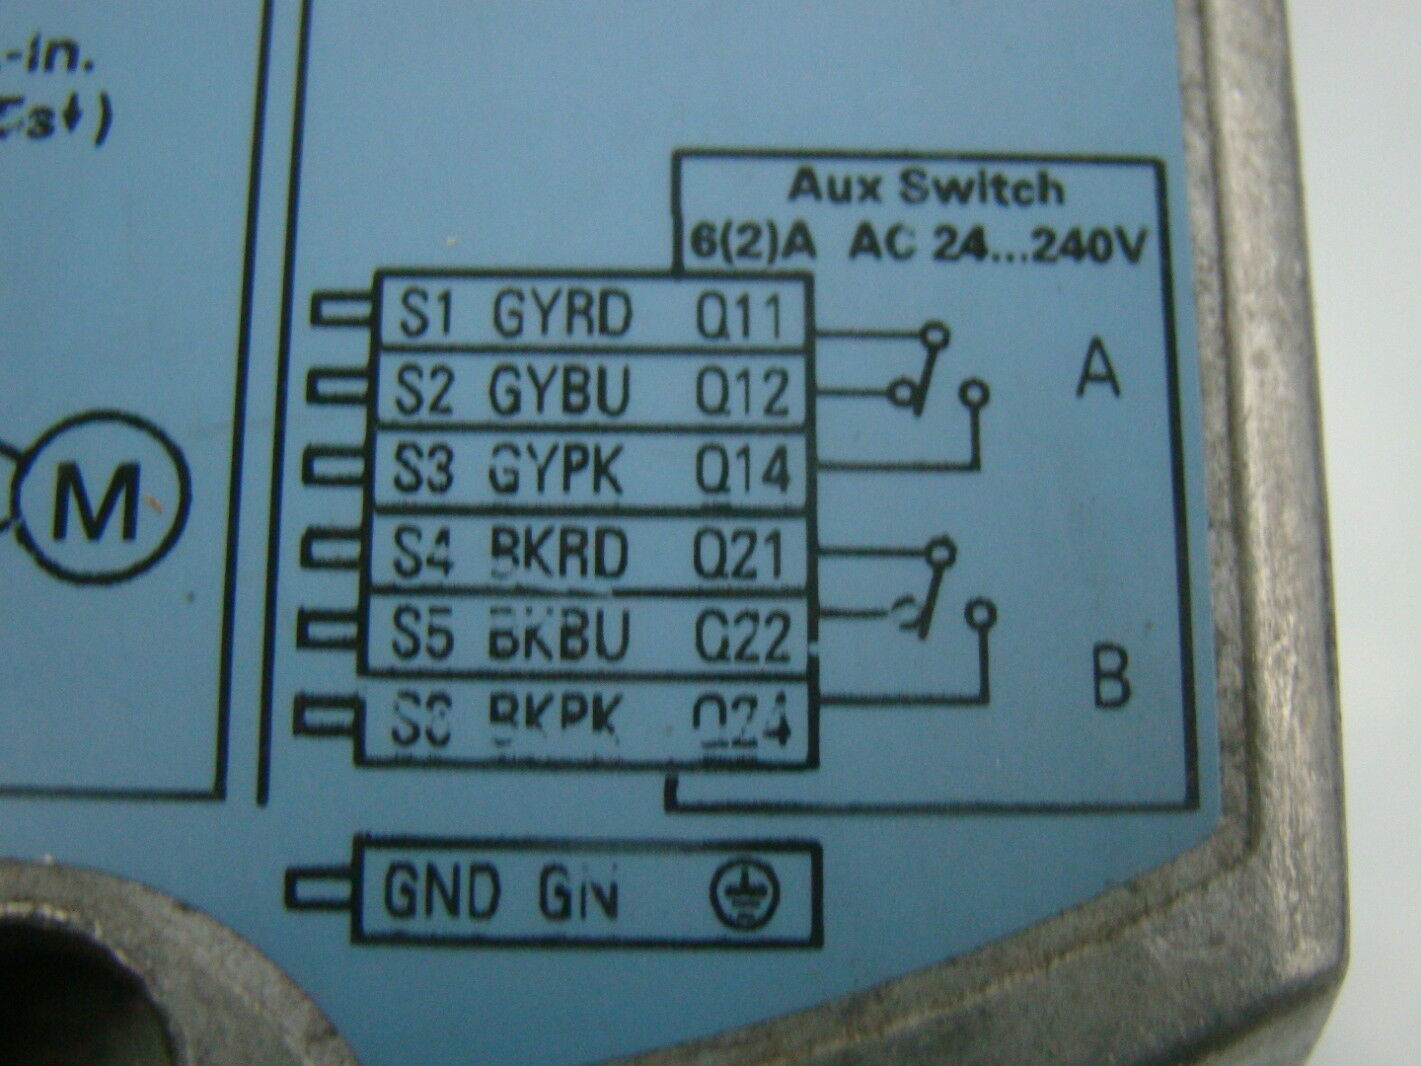 Siemens Damper Actuator Wiring Diagram - DIY Wiring Diagrams •